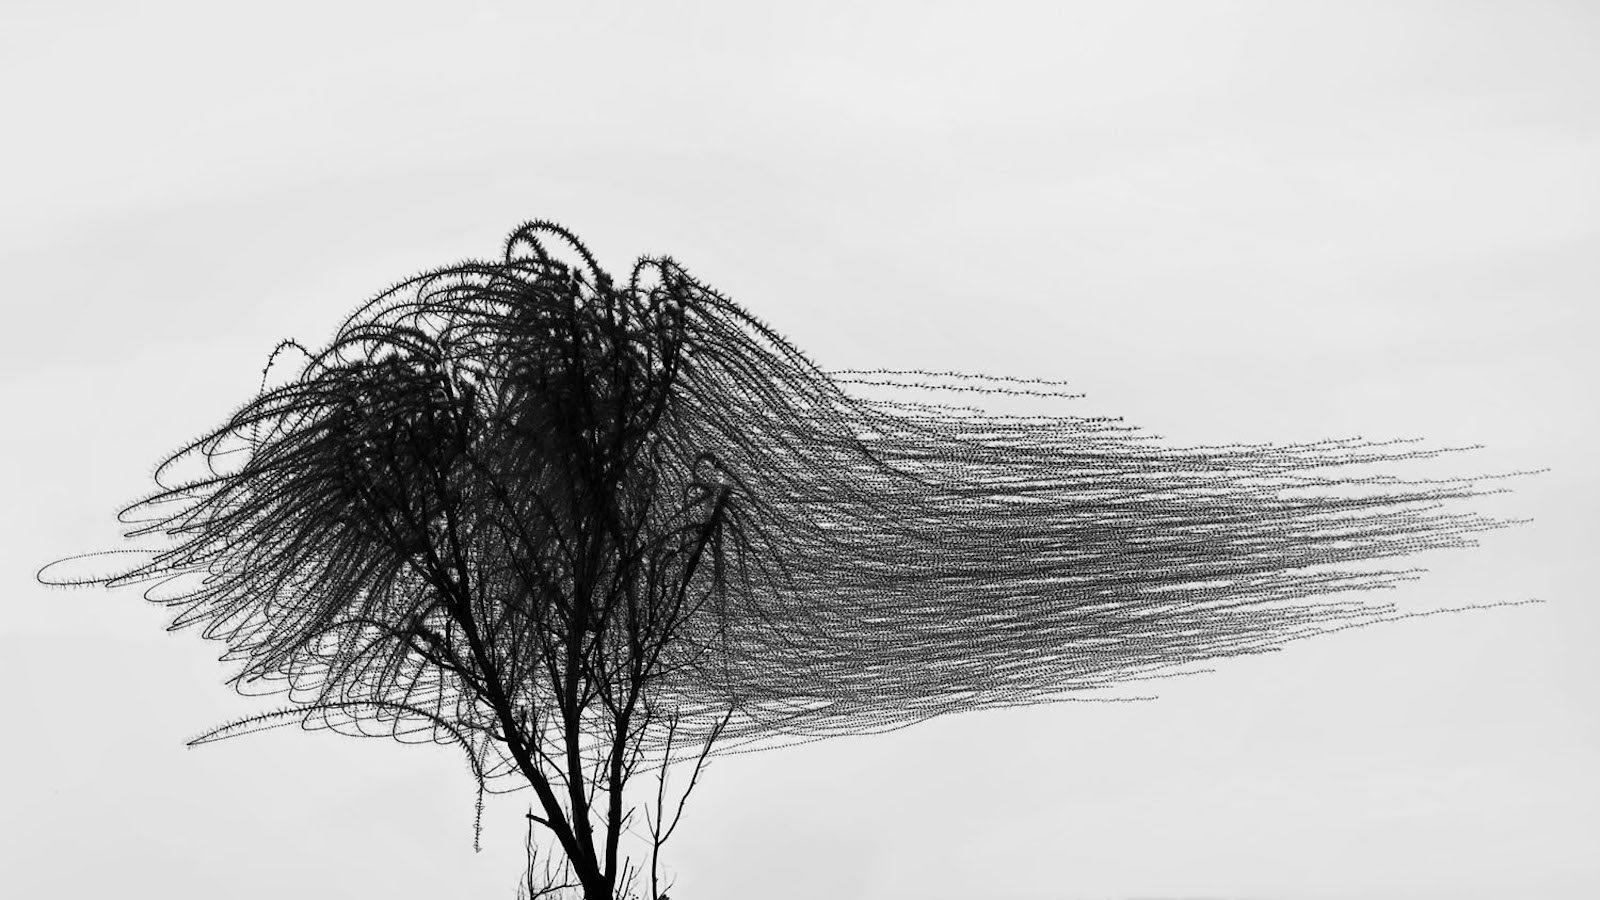 IGNANT-Photography-Xavi-Bou-Ornitographies-004